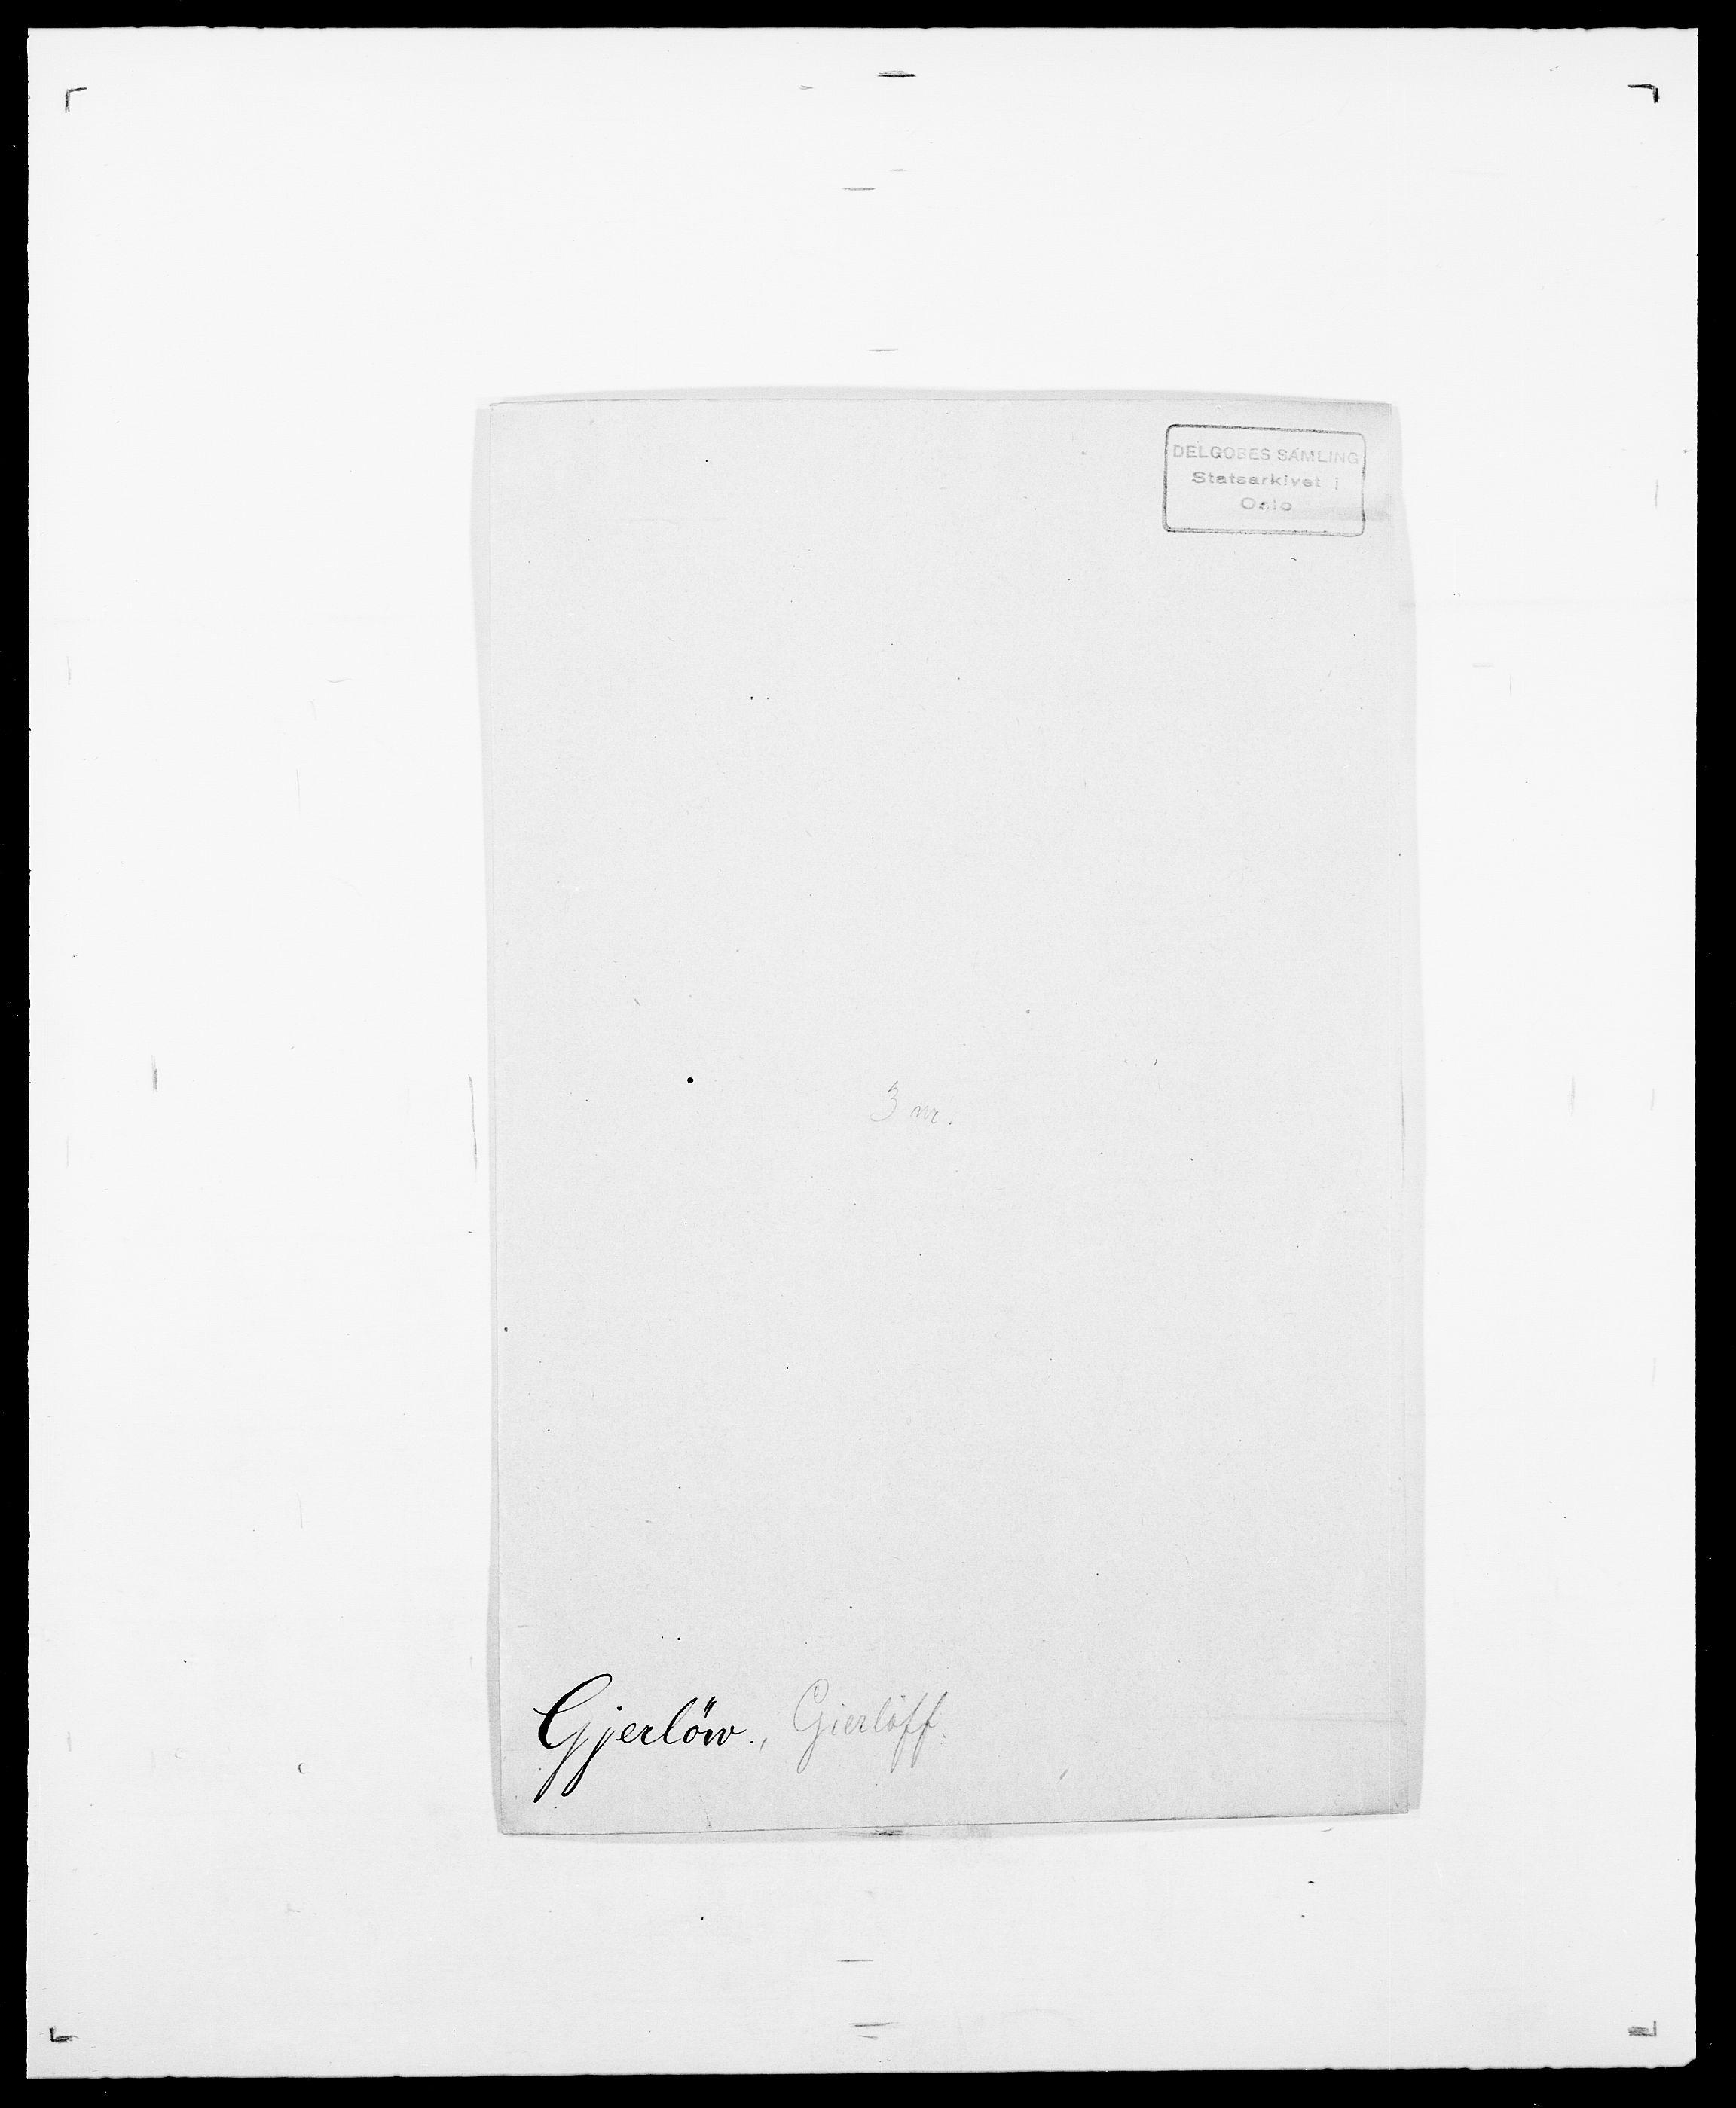 SAO, Delgobe, Charles Antoine - samling, D/Da/L0014: Giebdhausen - Grip, s. 138